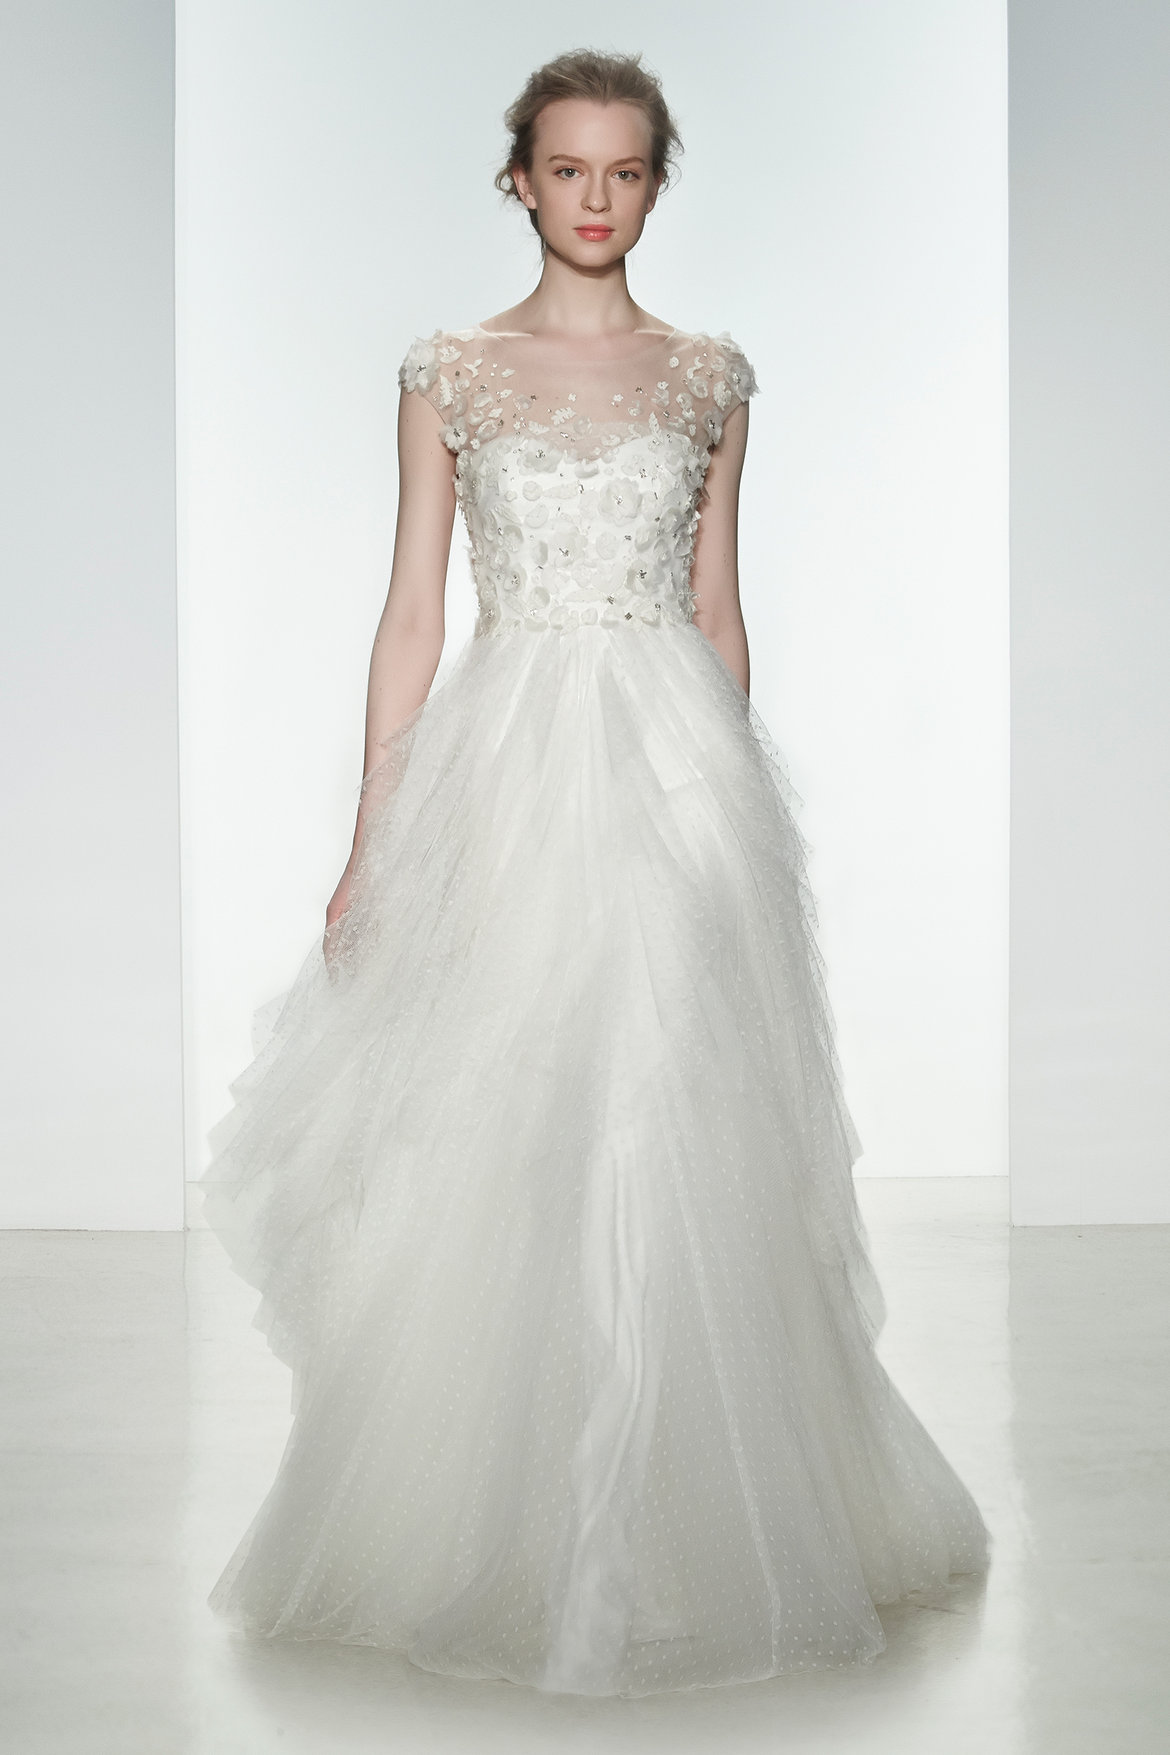 Wedding Wedding Dresses 2014 the 25 most popular wedding gowns of 2014 bridalguide christos dress lola